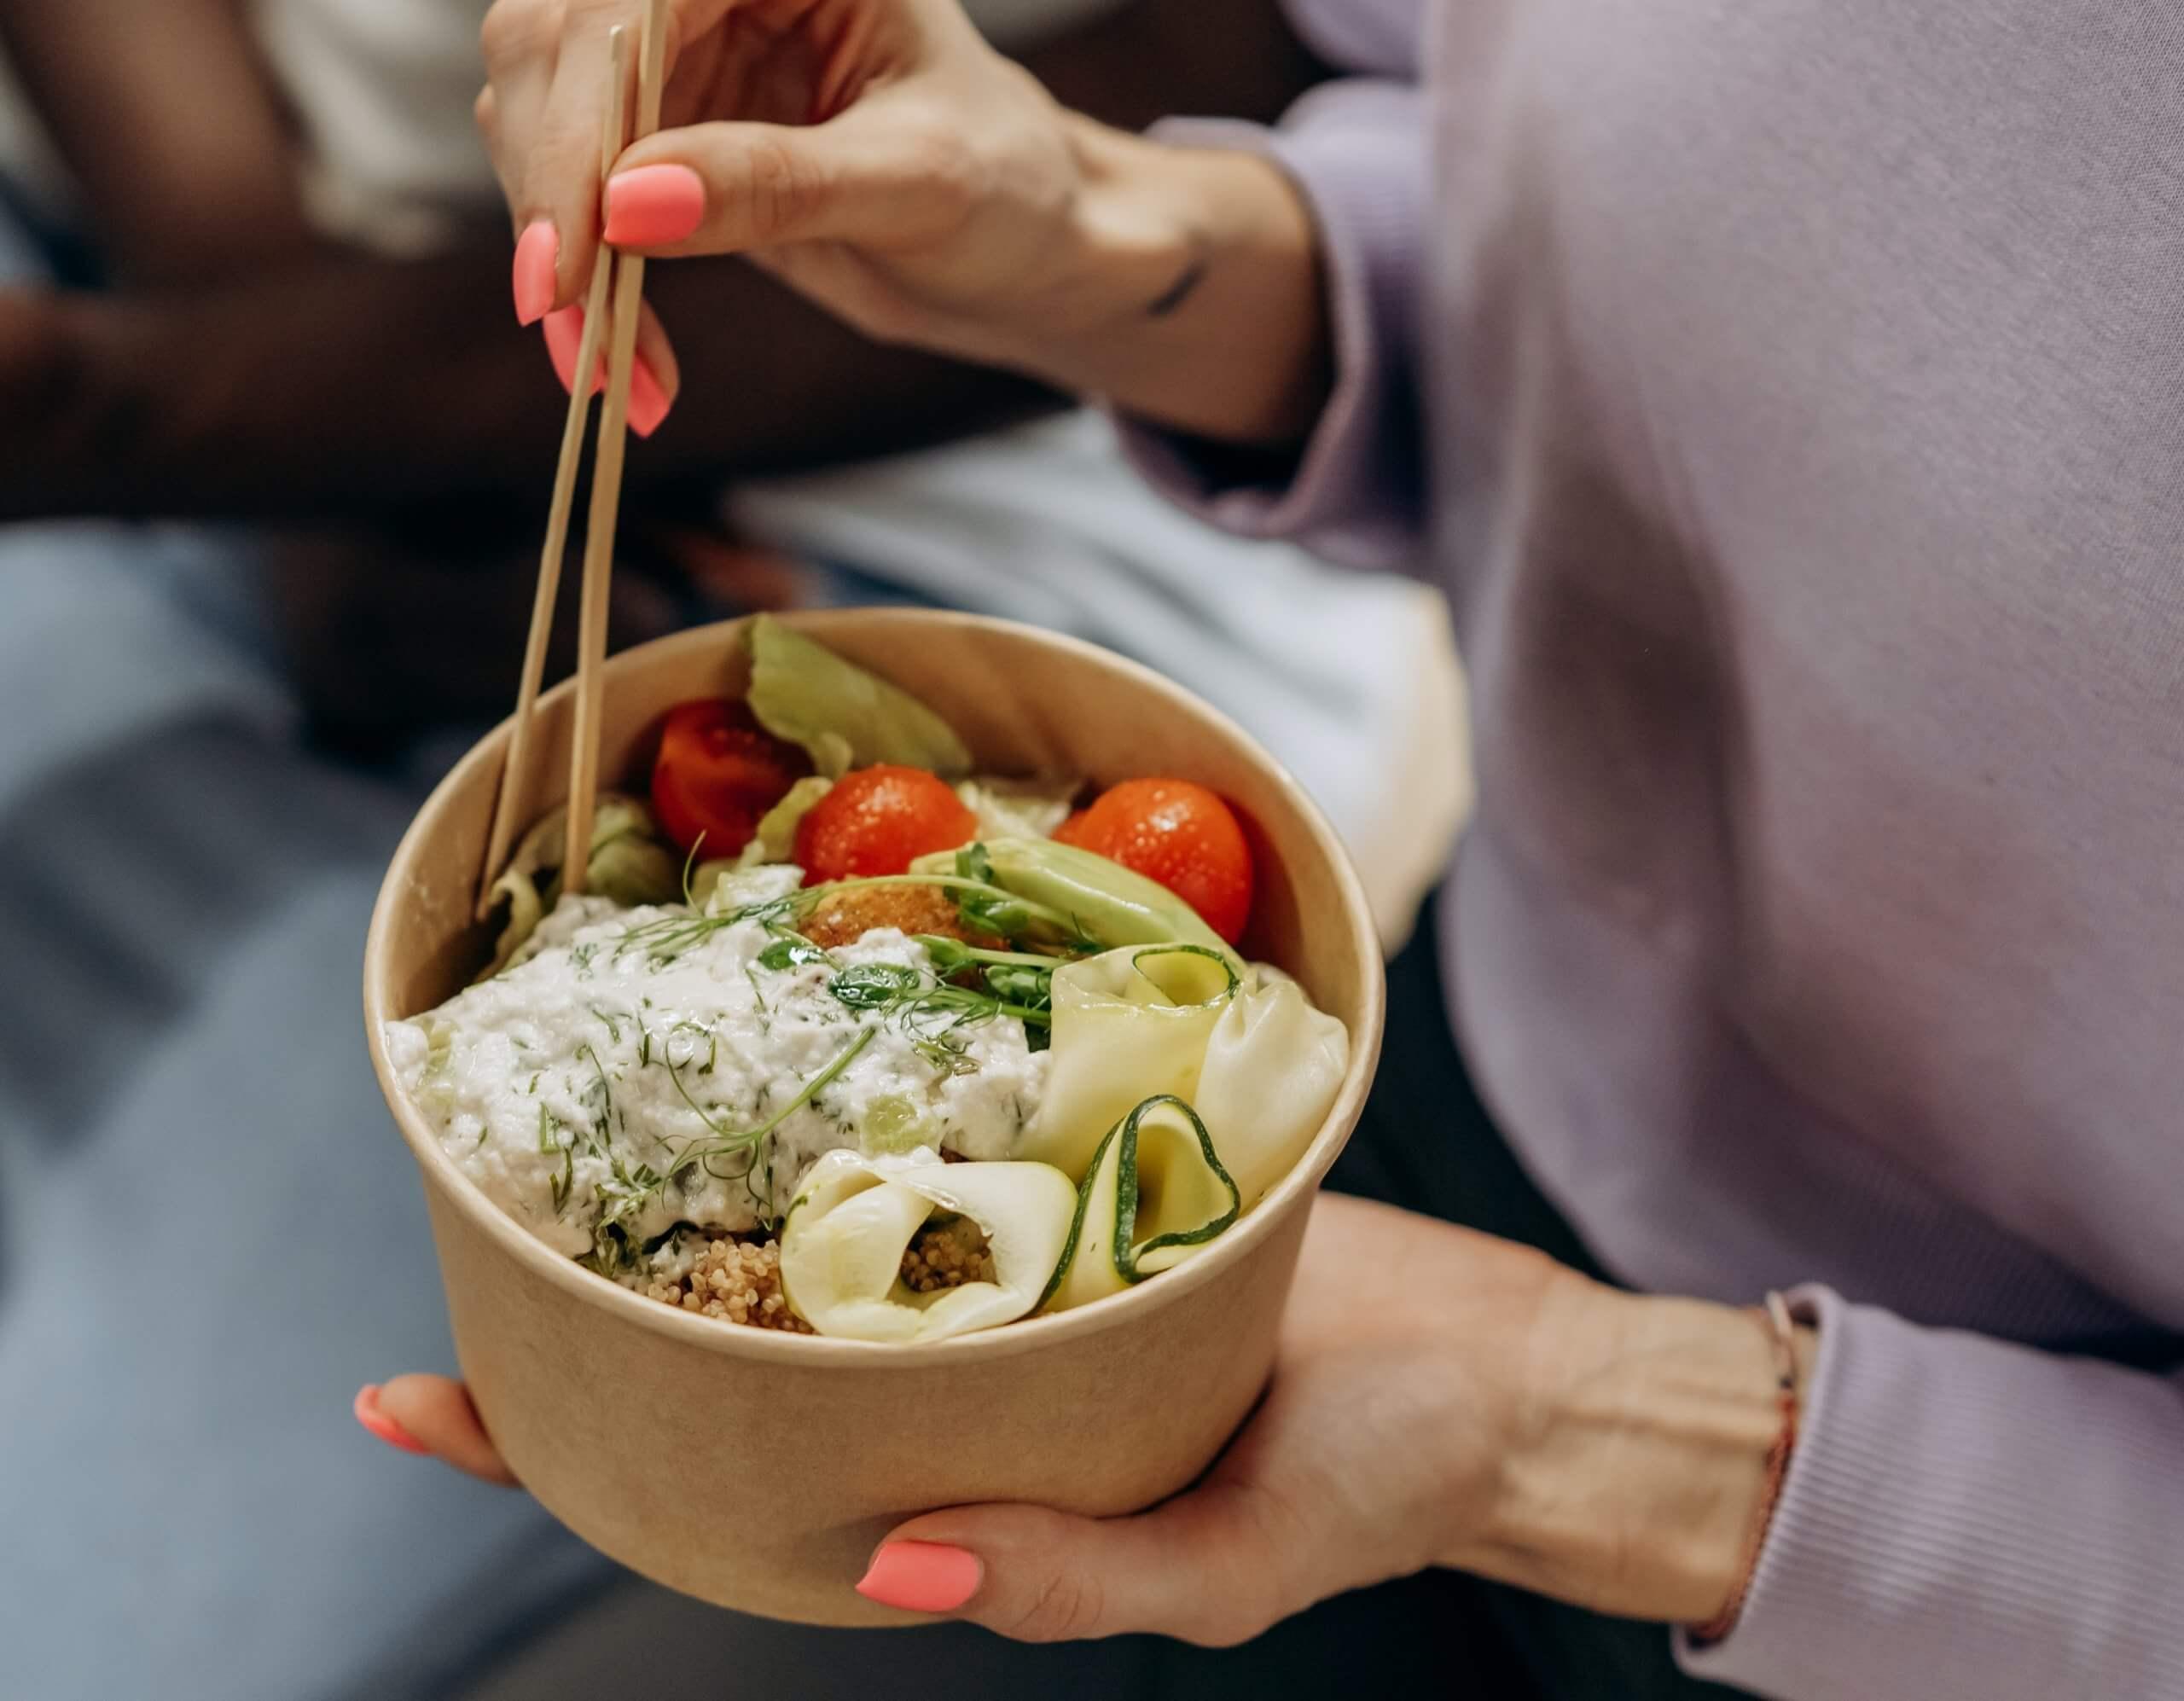 Read more about the article 上班族午餐怎麼吃? 記住選擇好醣 +3項飲食技巧,吃外食也能輕盈不發胖